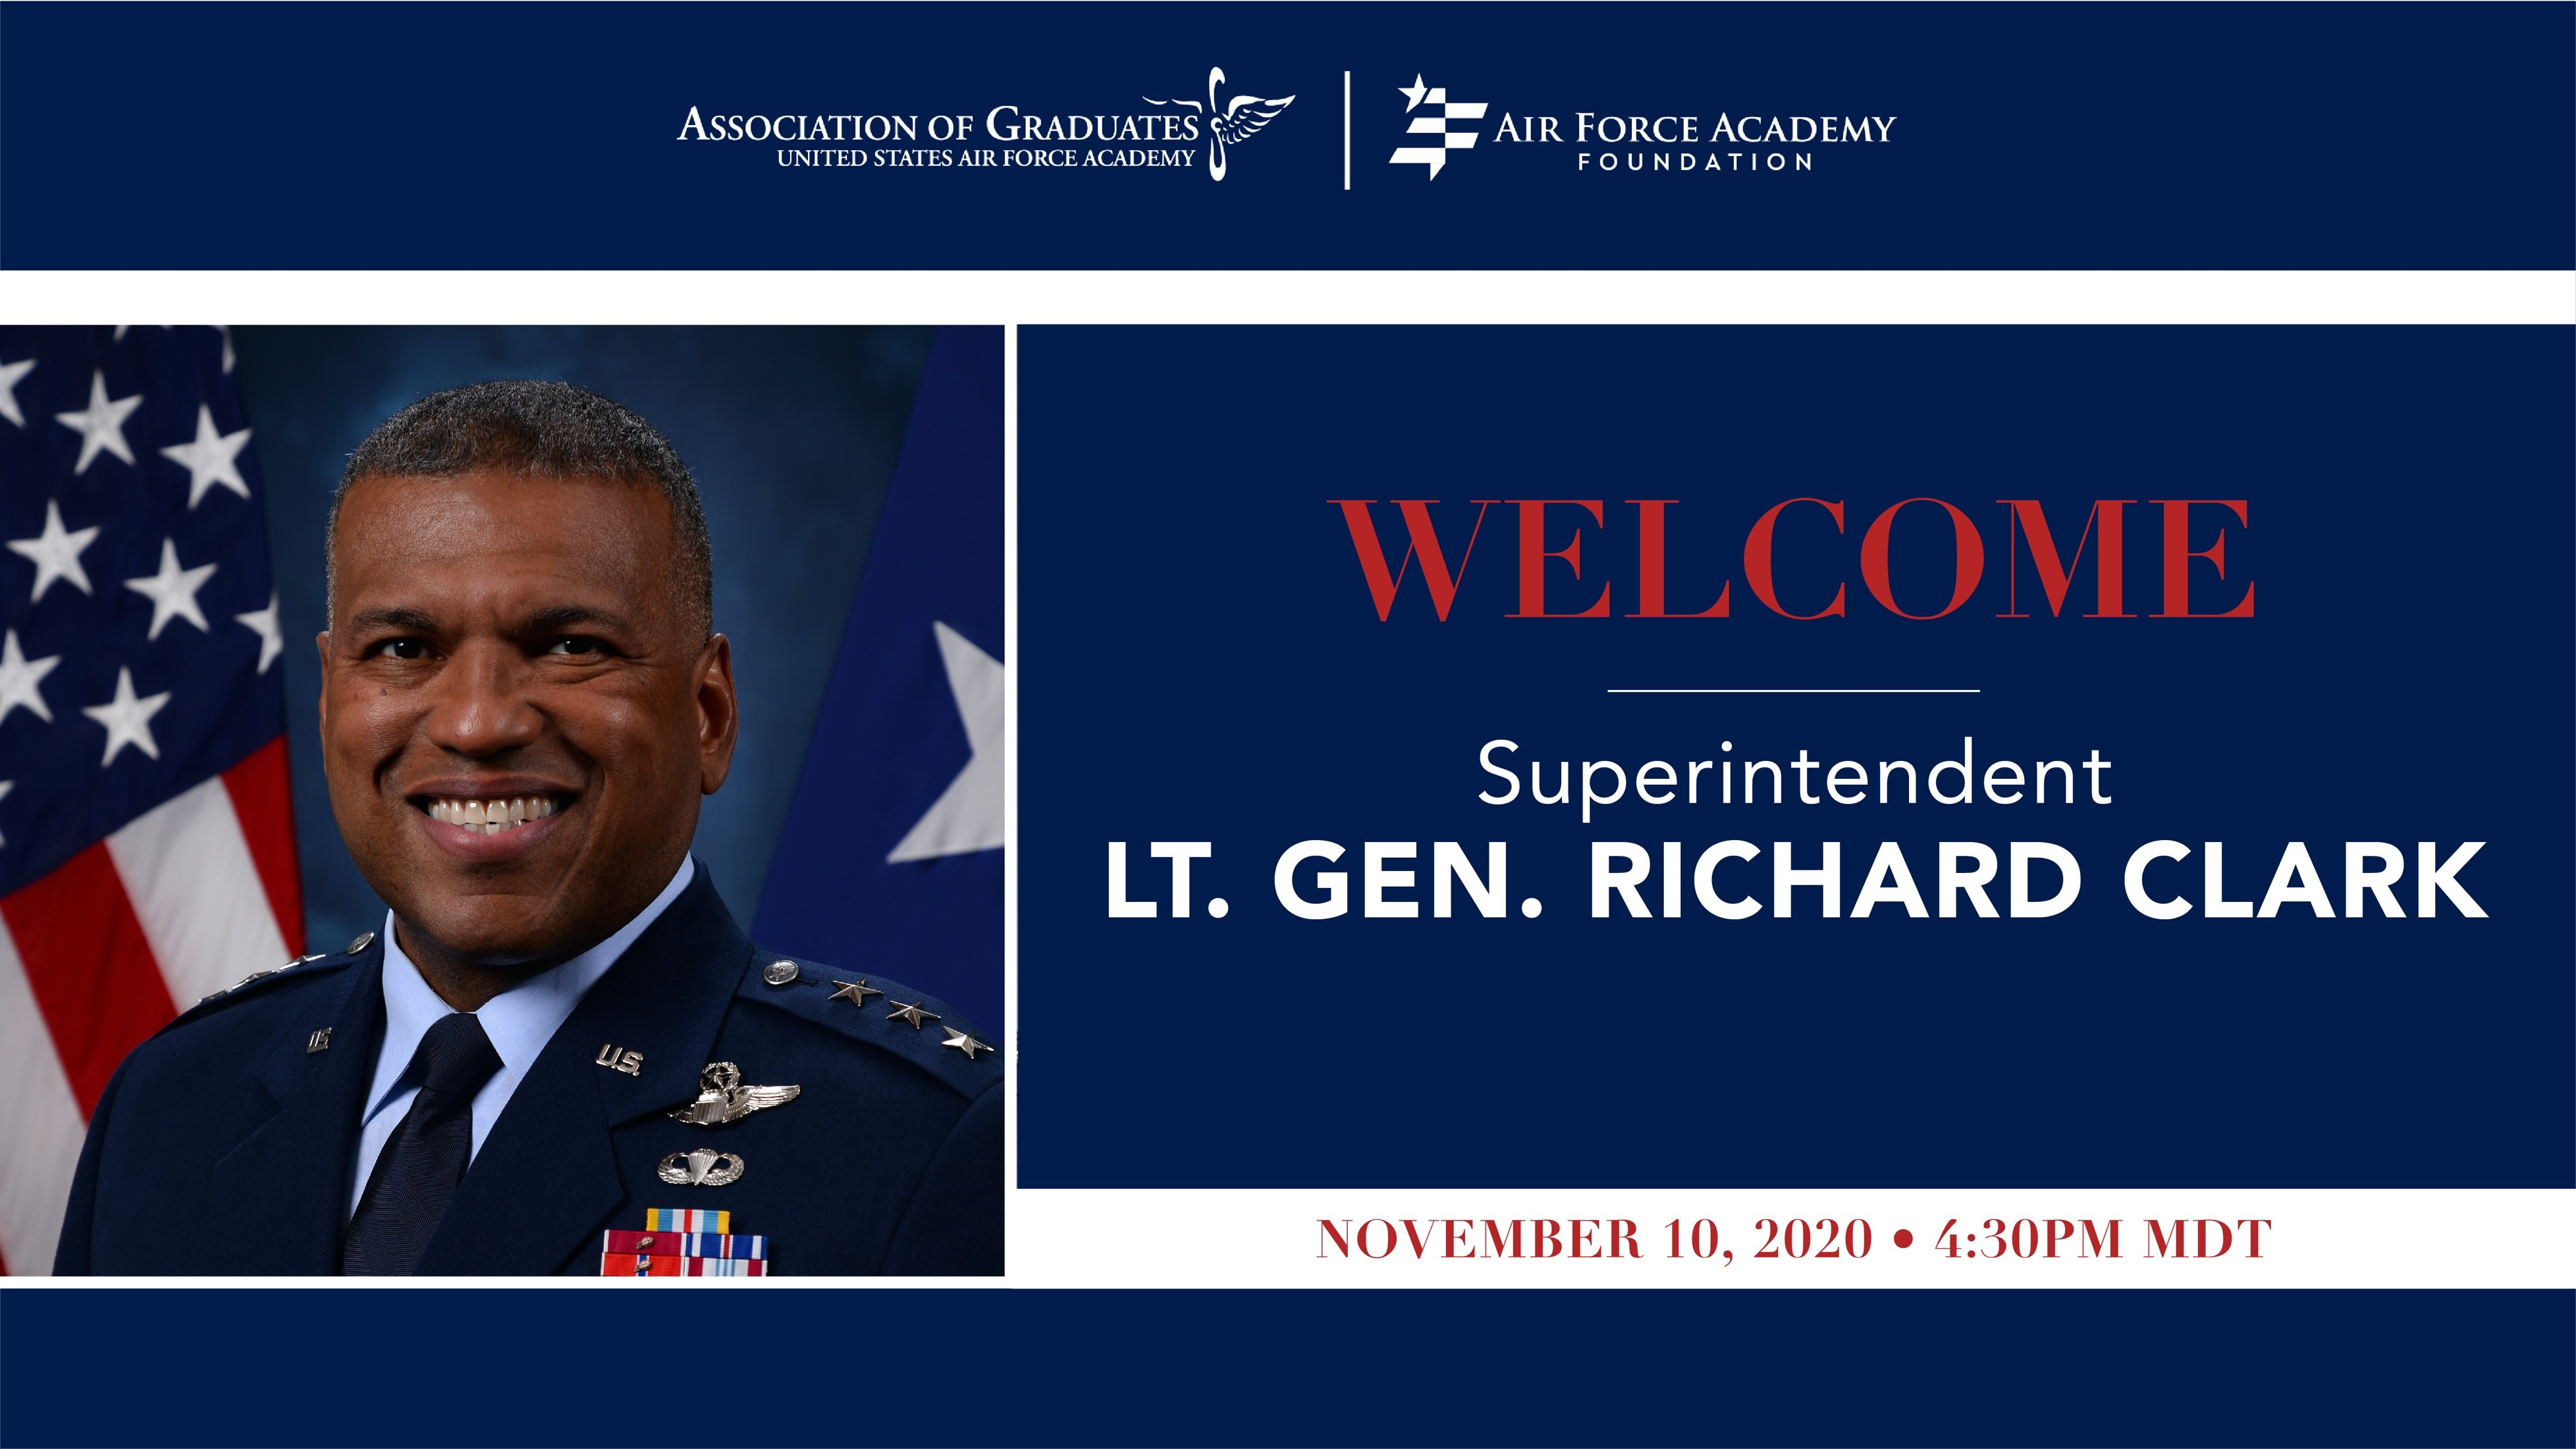 Image for Welcome Call for Lt. Gen. Richard Clark webinar